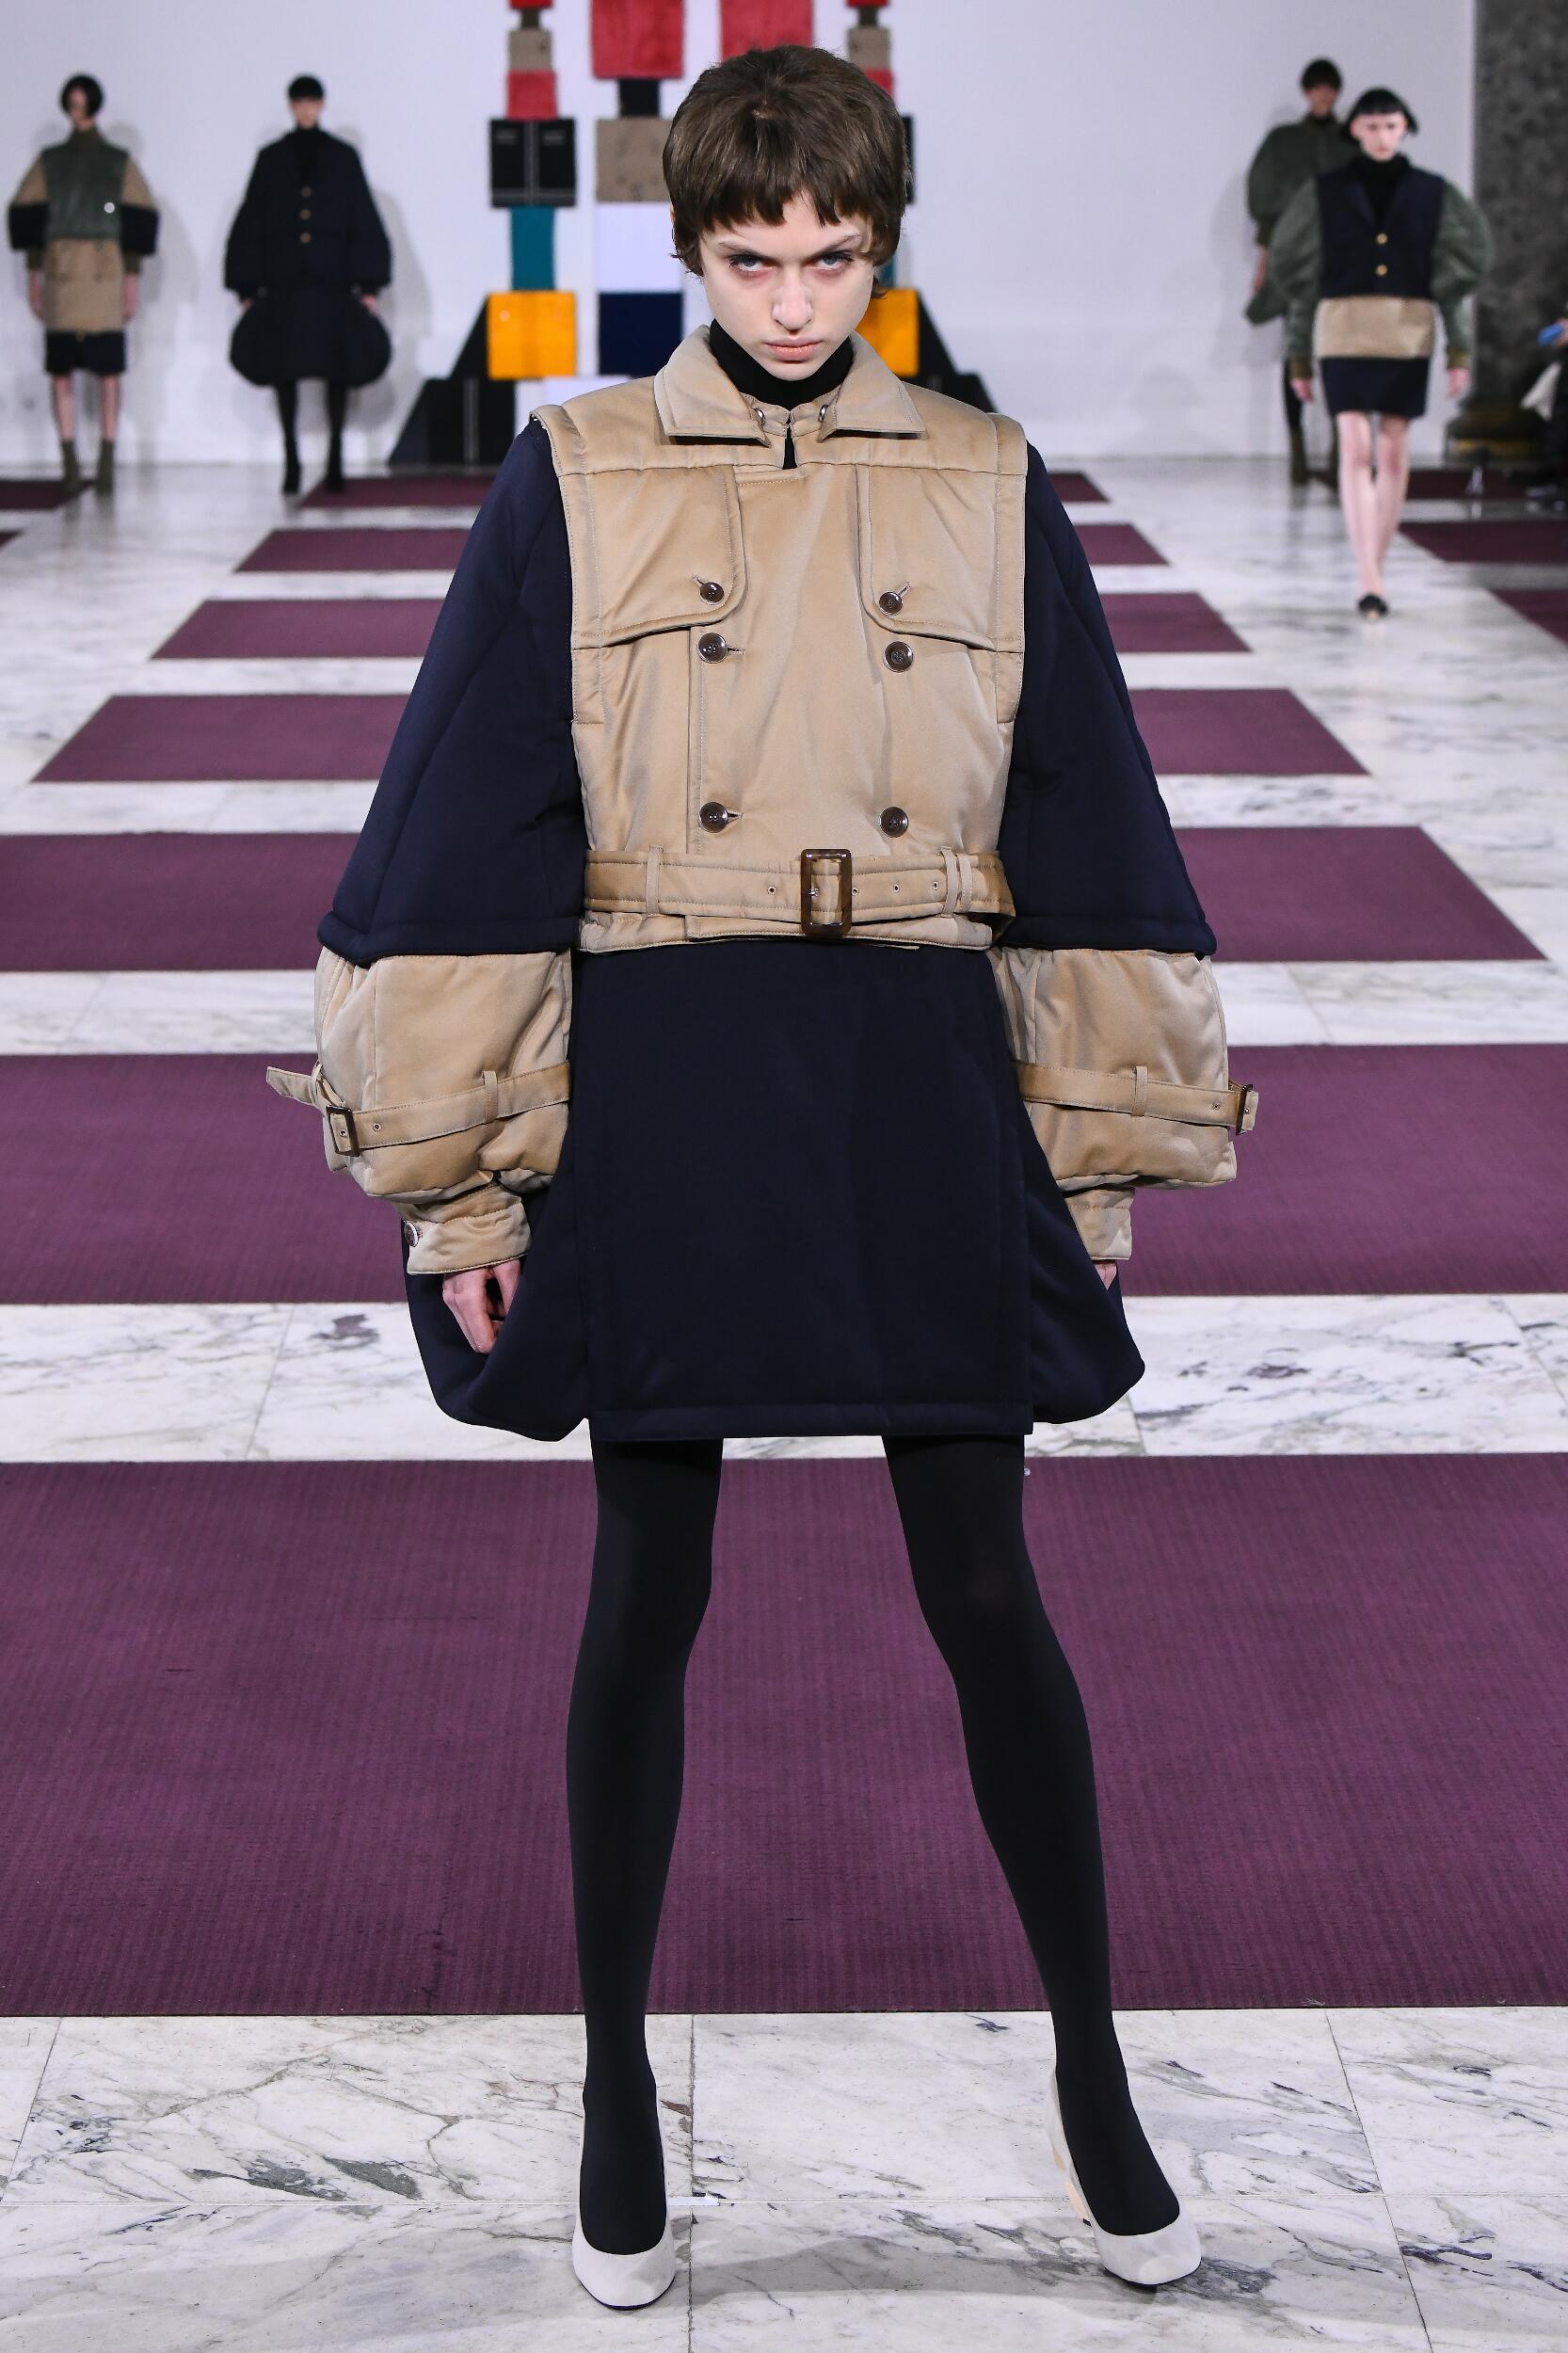 FW 2020-21 Fashion Show Anrealage